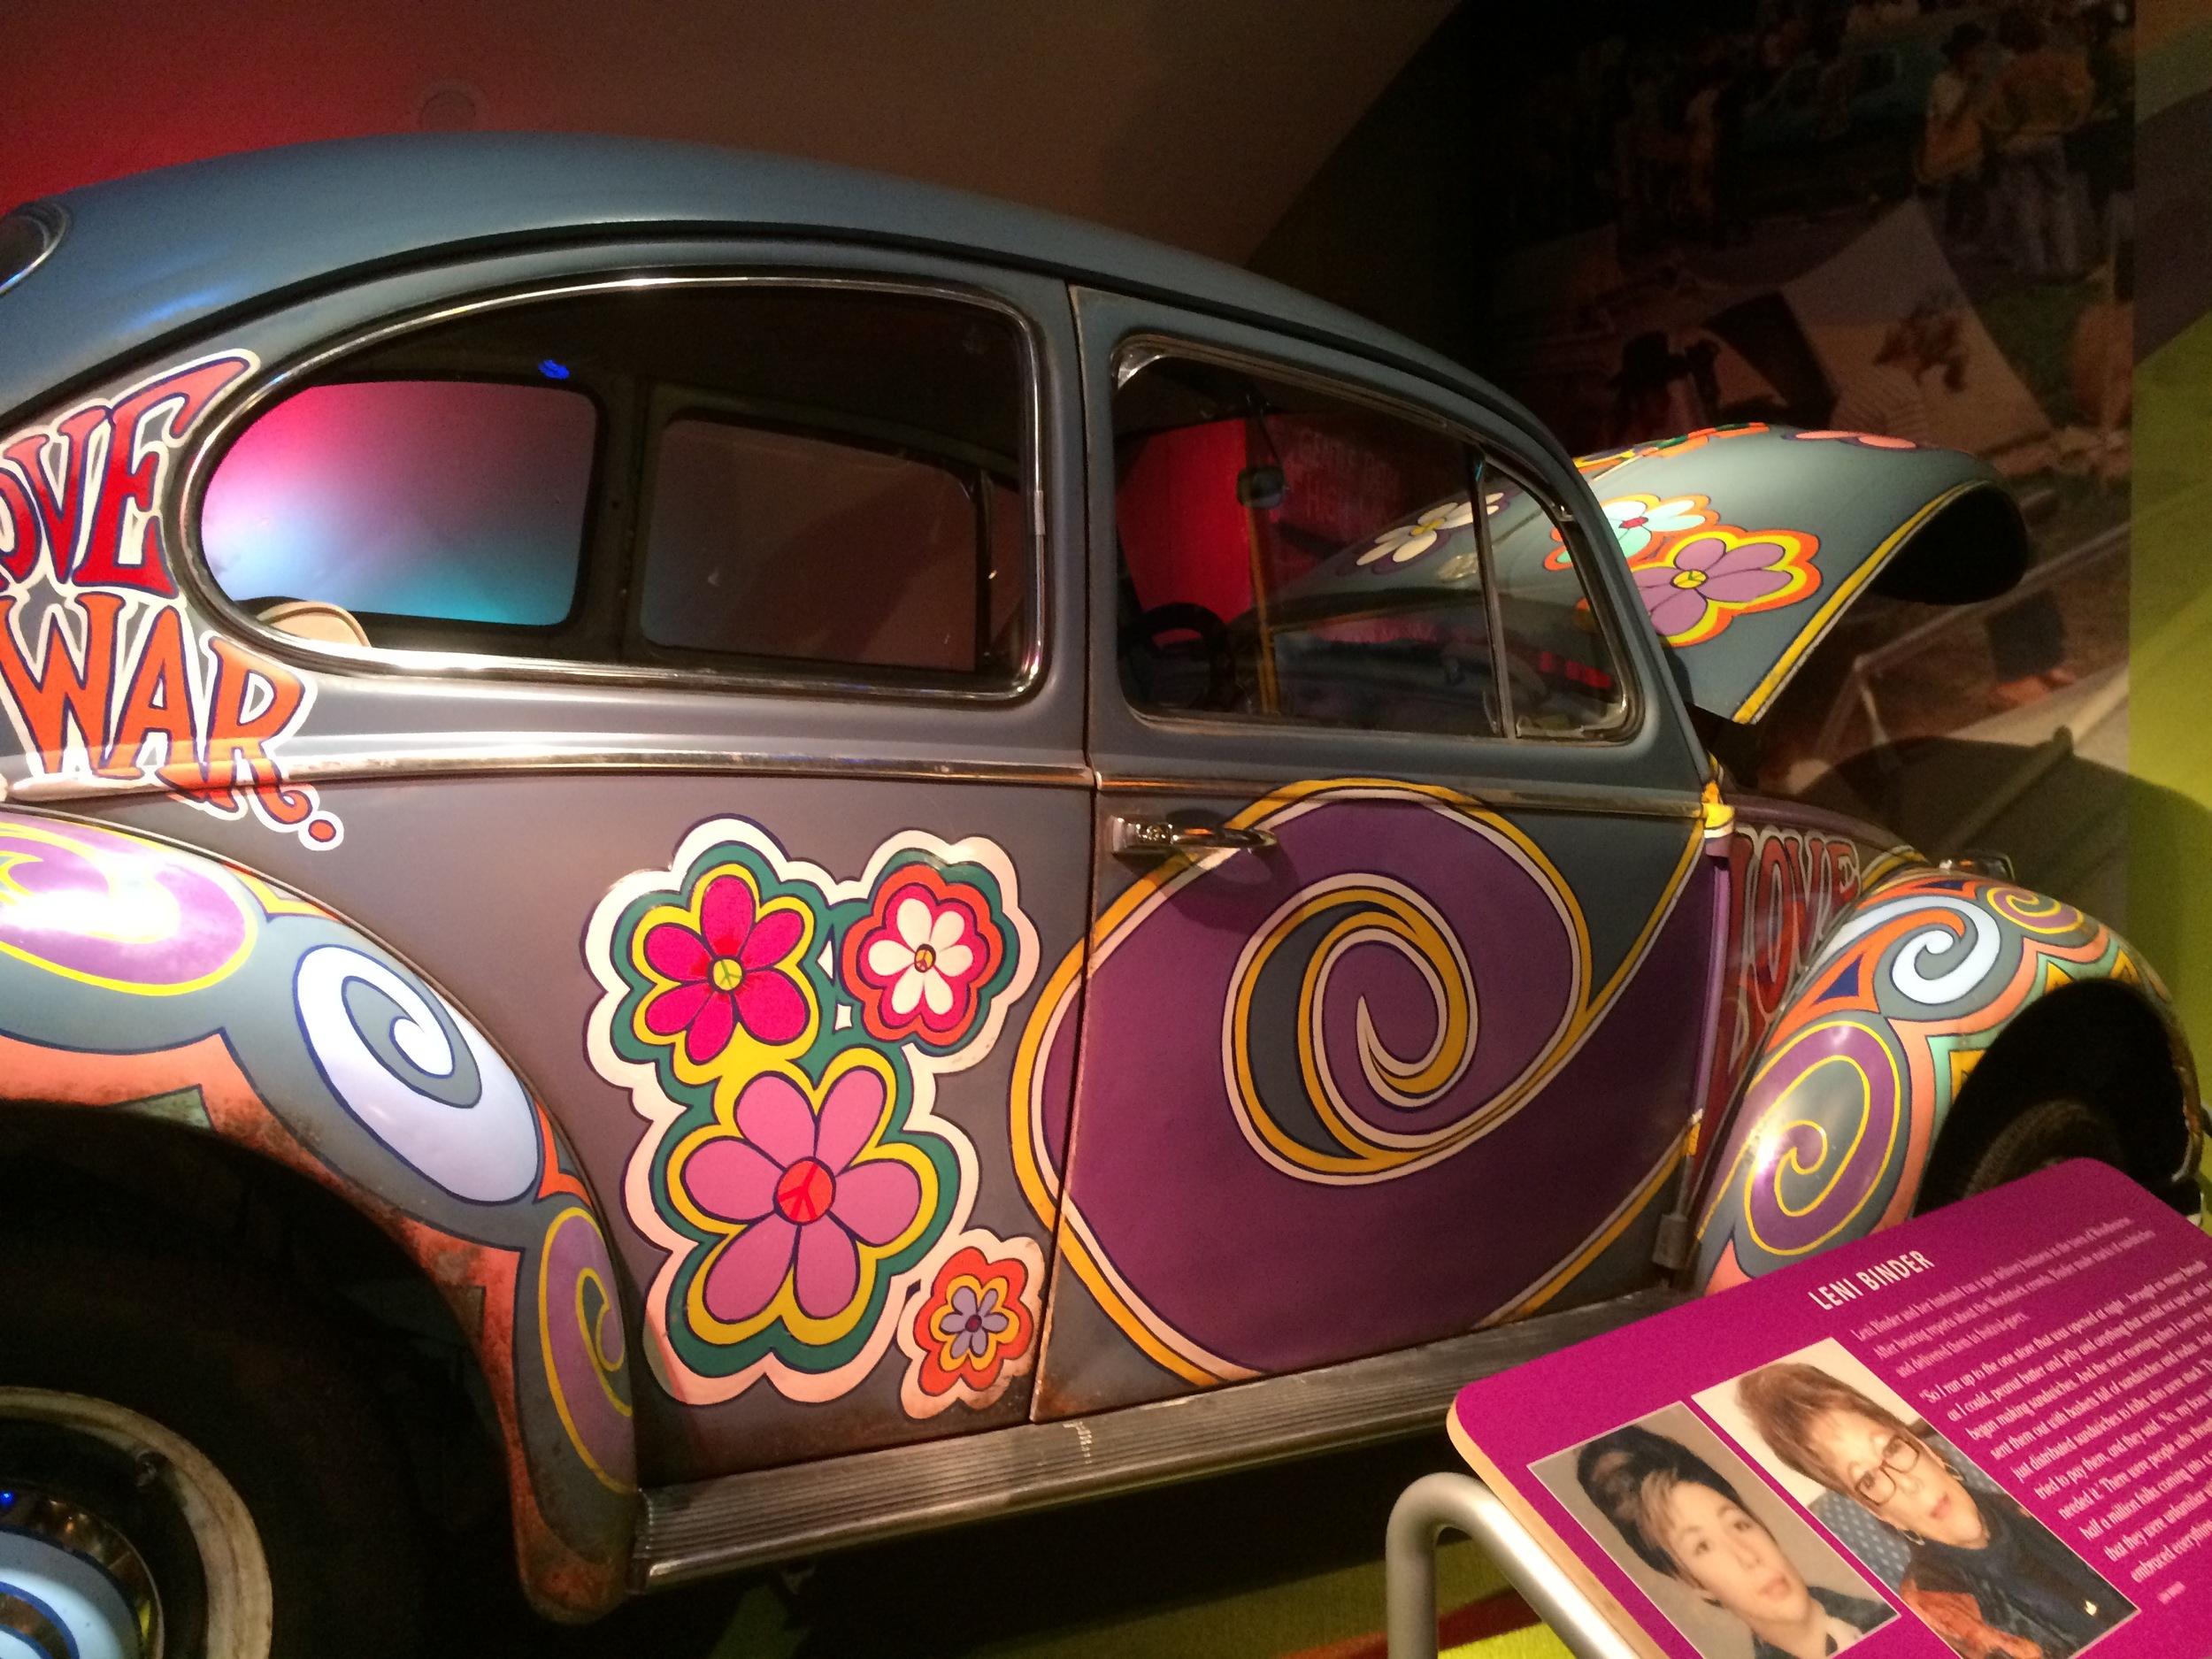 VW Display  (Jennifer Merrick)